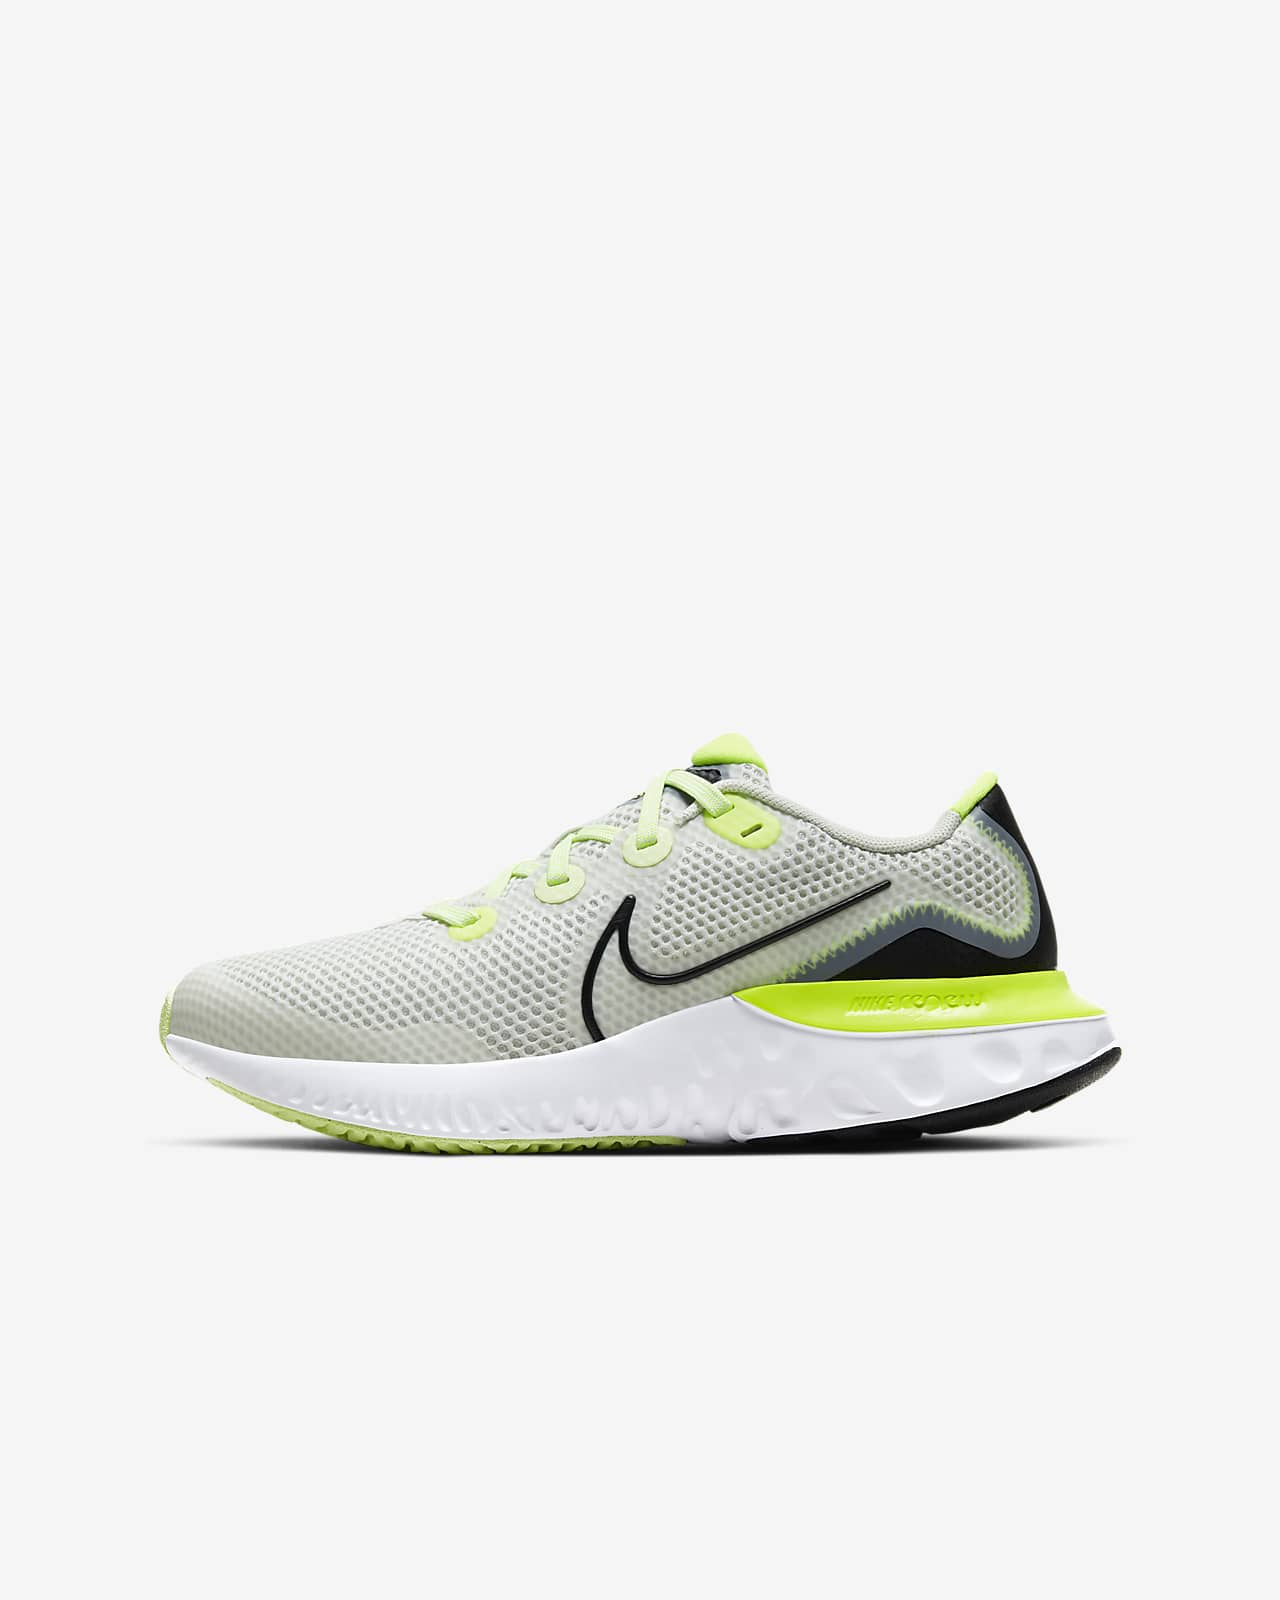 palma aniversario Actriz  Nike Renew Run Zapatillas de running - Niño/a. Nike ES